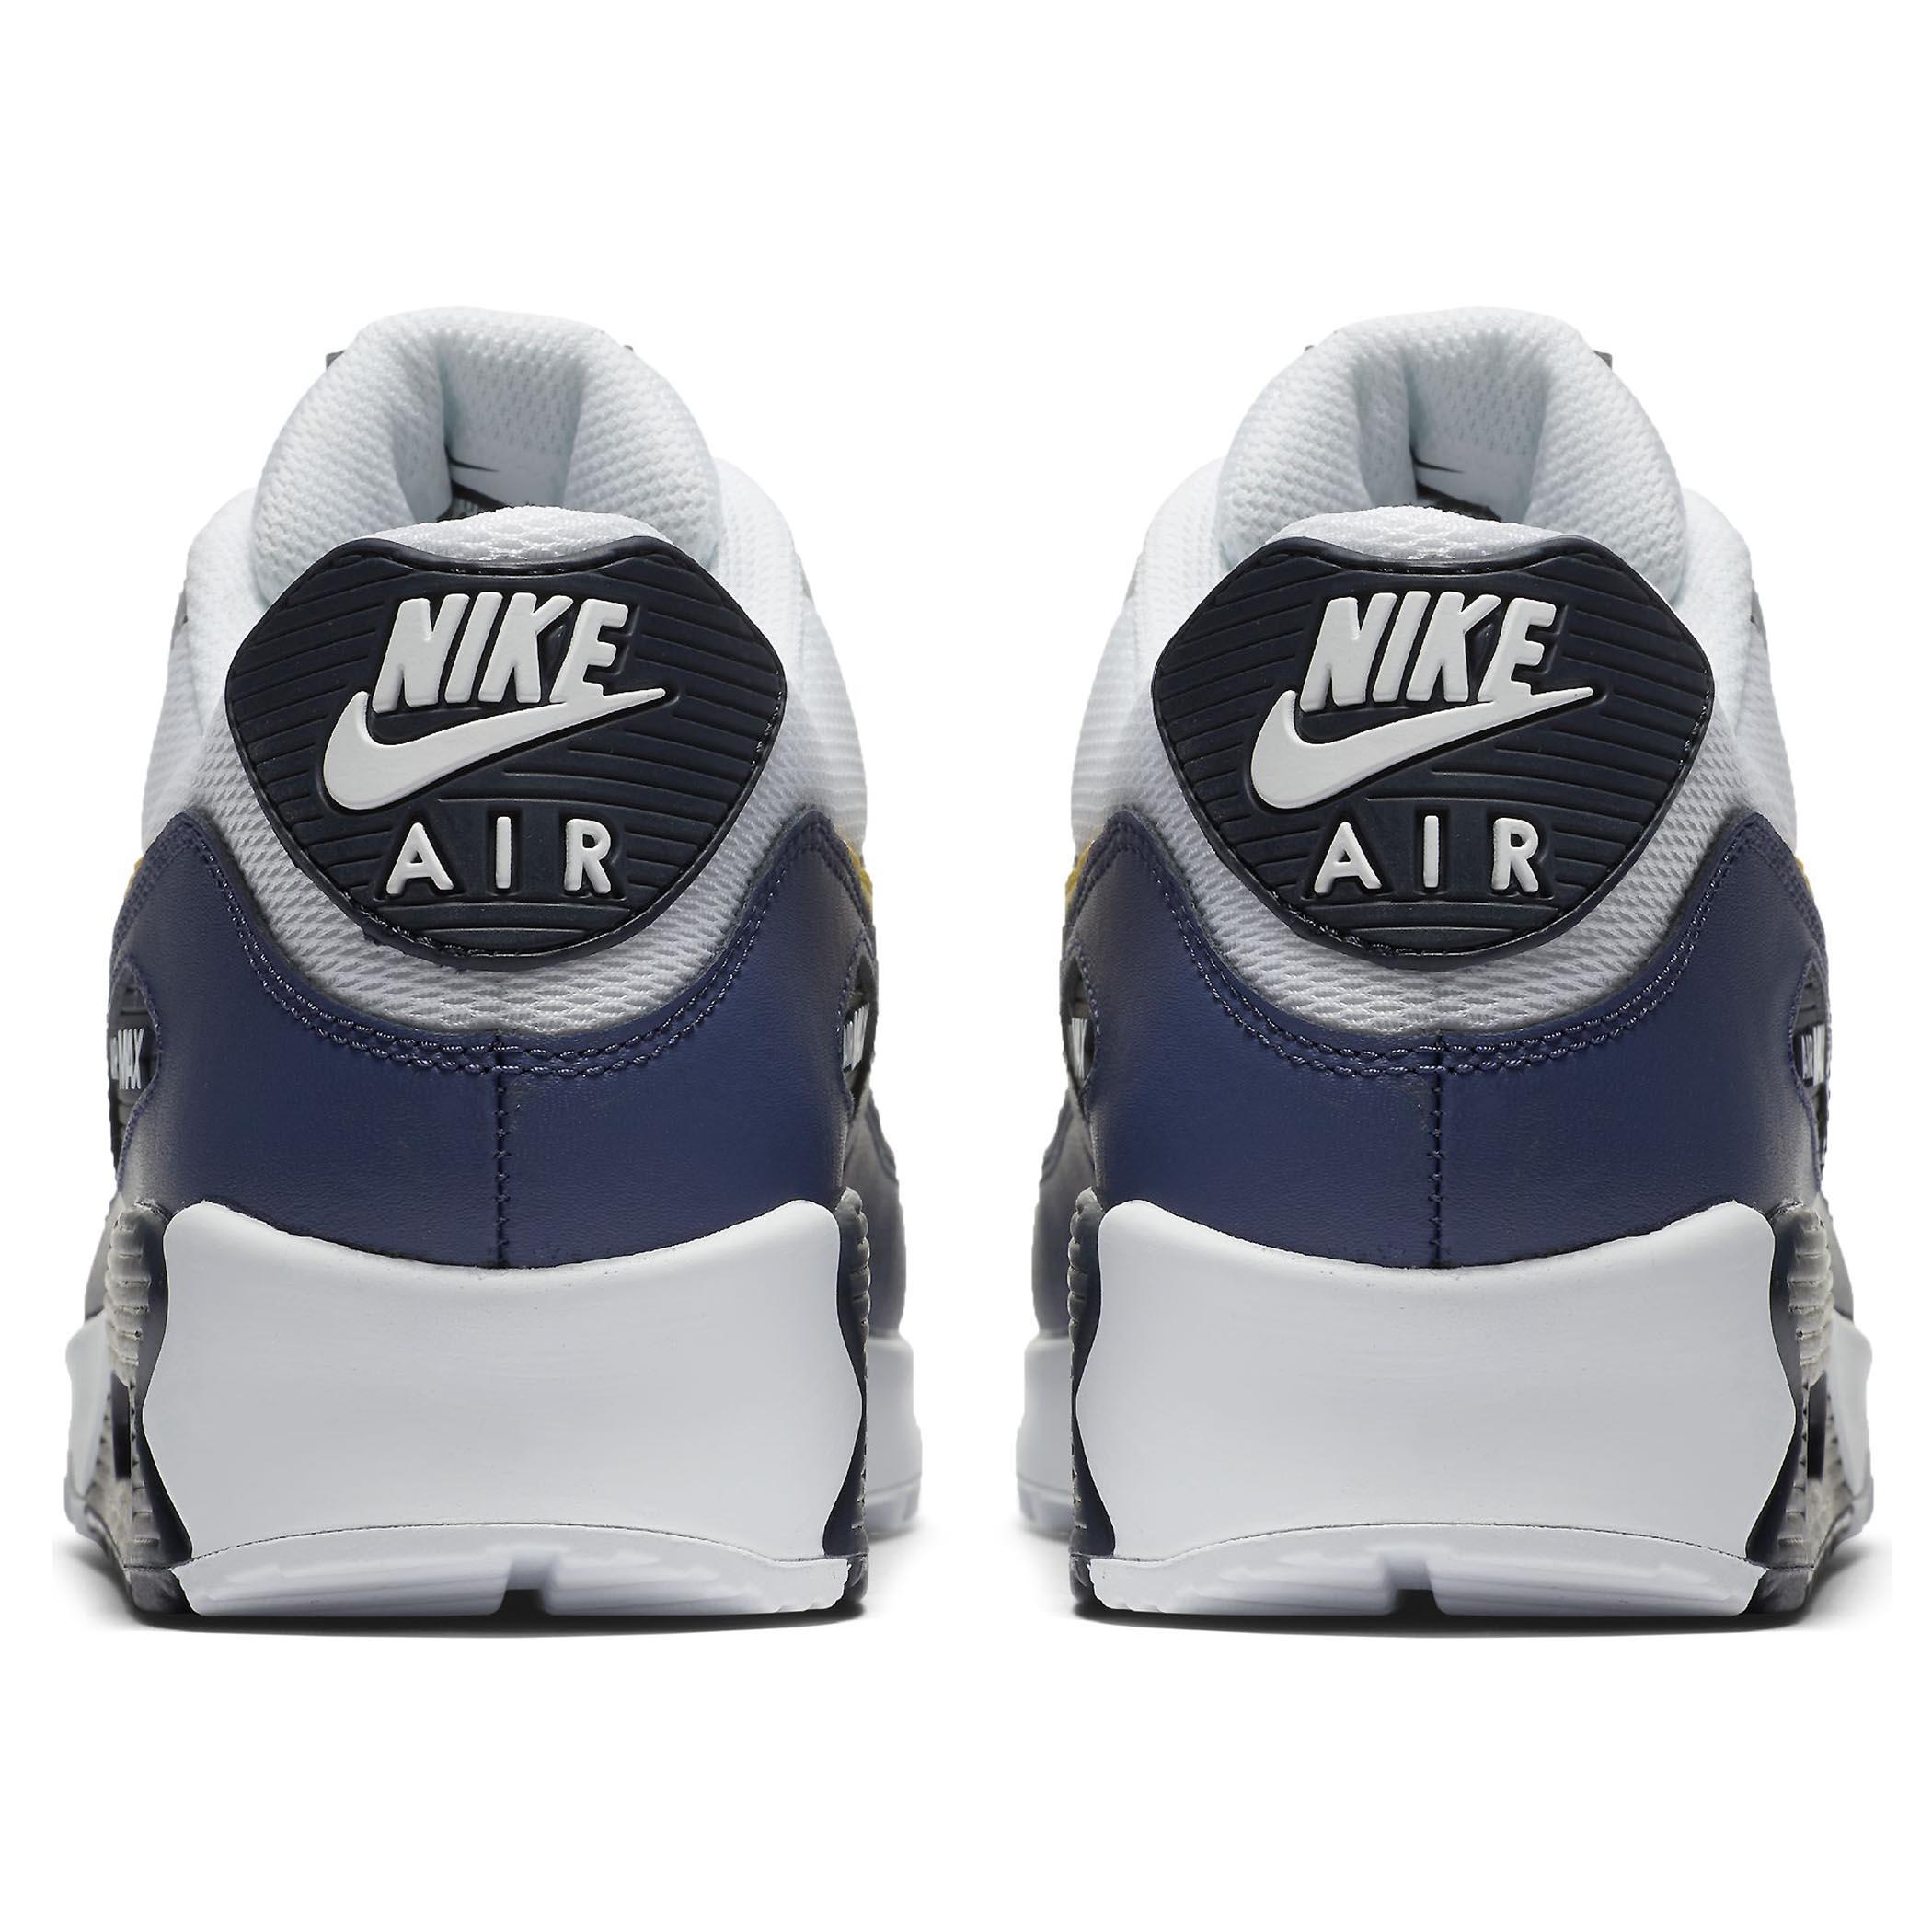 19775997 Мужские кроссовки Nike Air Max 90 Essential White/Tour Yellow-Blue Recall -  фото